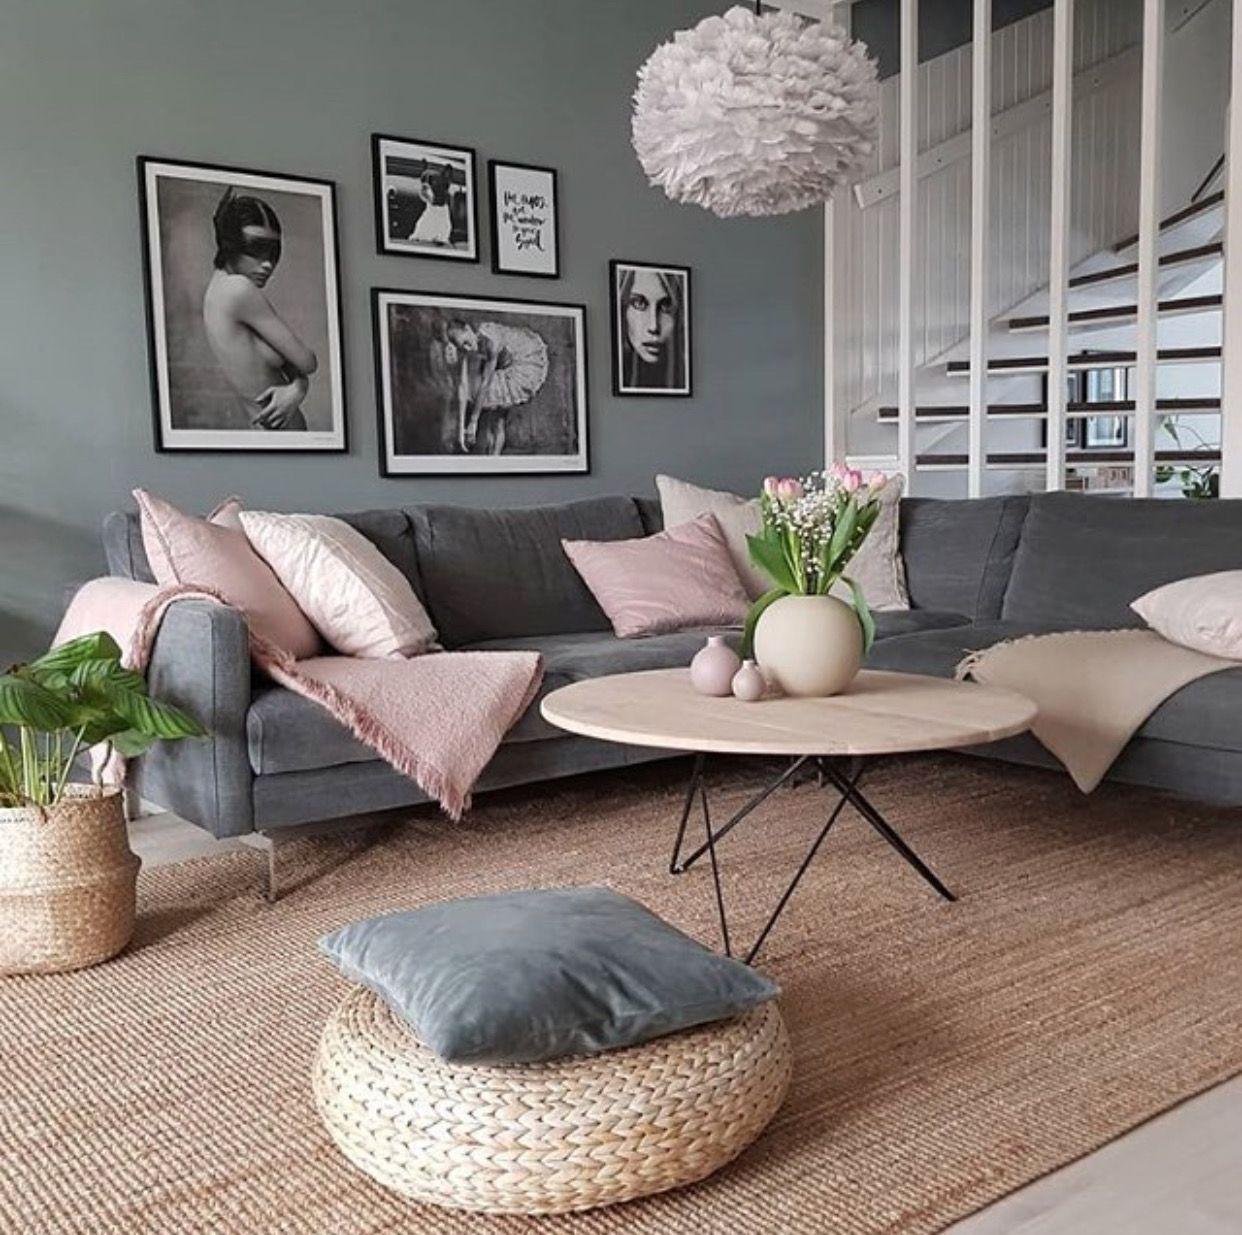 Living room decor ideas also descubre  comparte las imagenes mas hermosas del mundo home rh pinterest